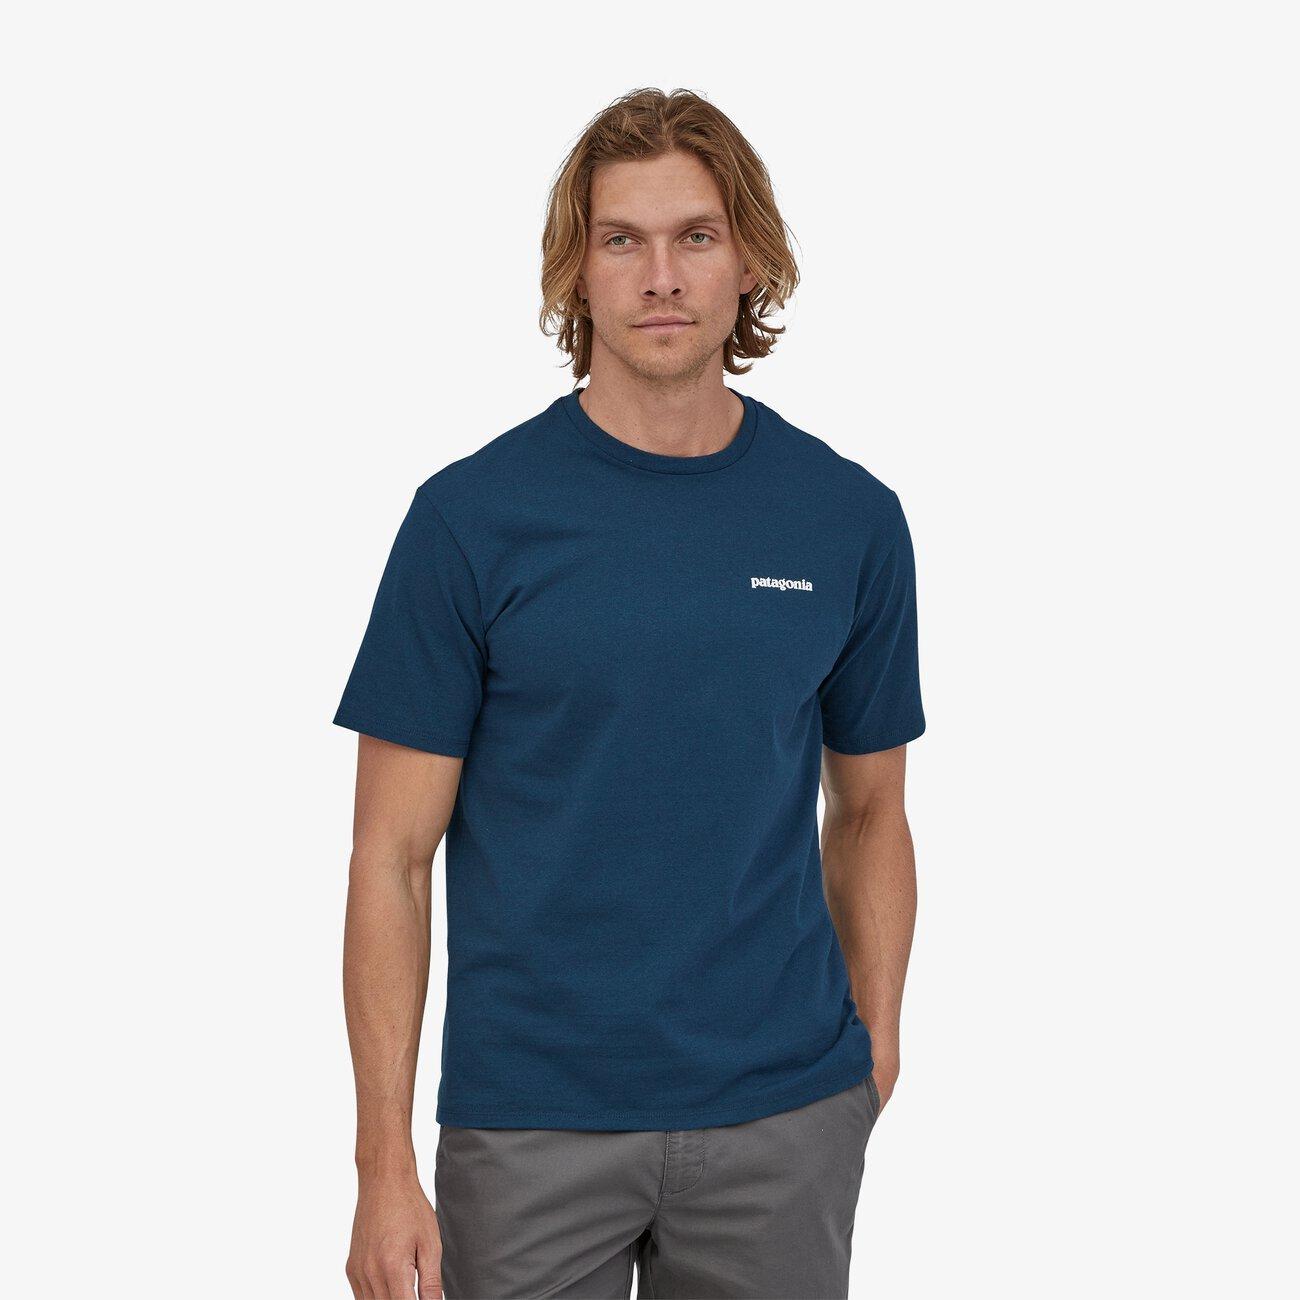 Patagonia_Men's_P-6_Logo_Responsibili_Tee_crater_blue